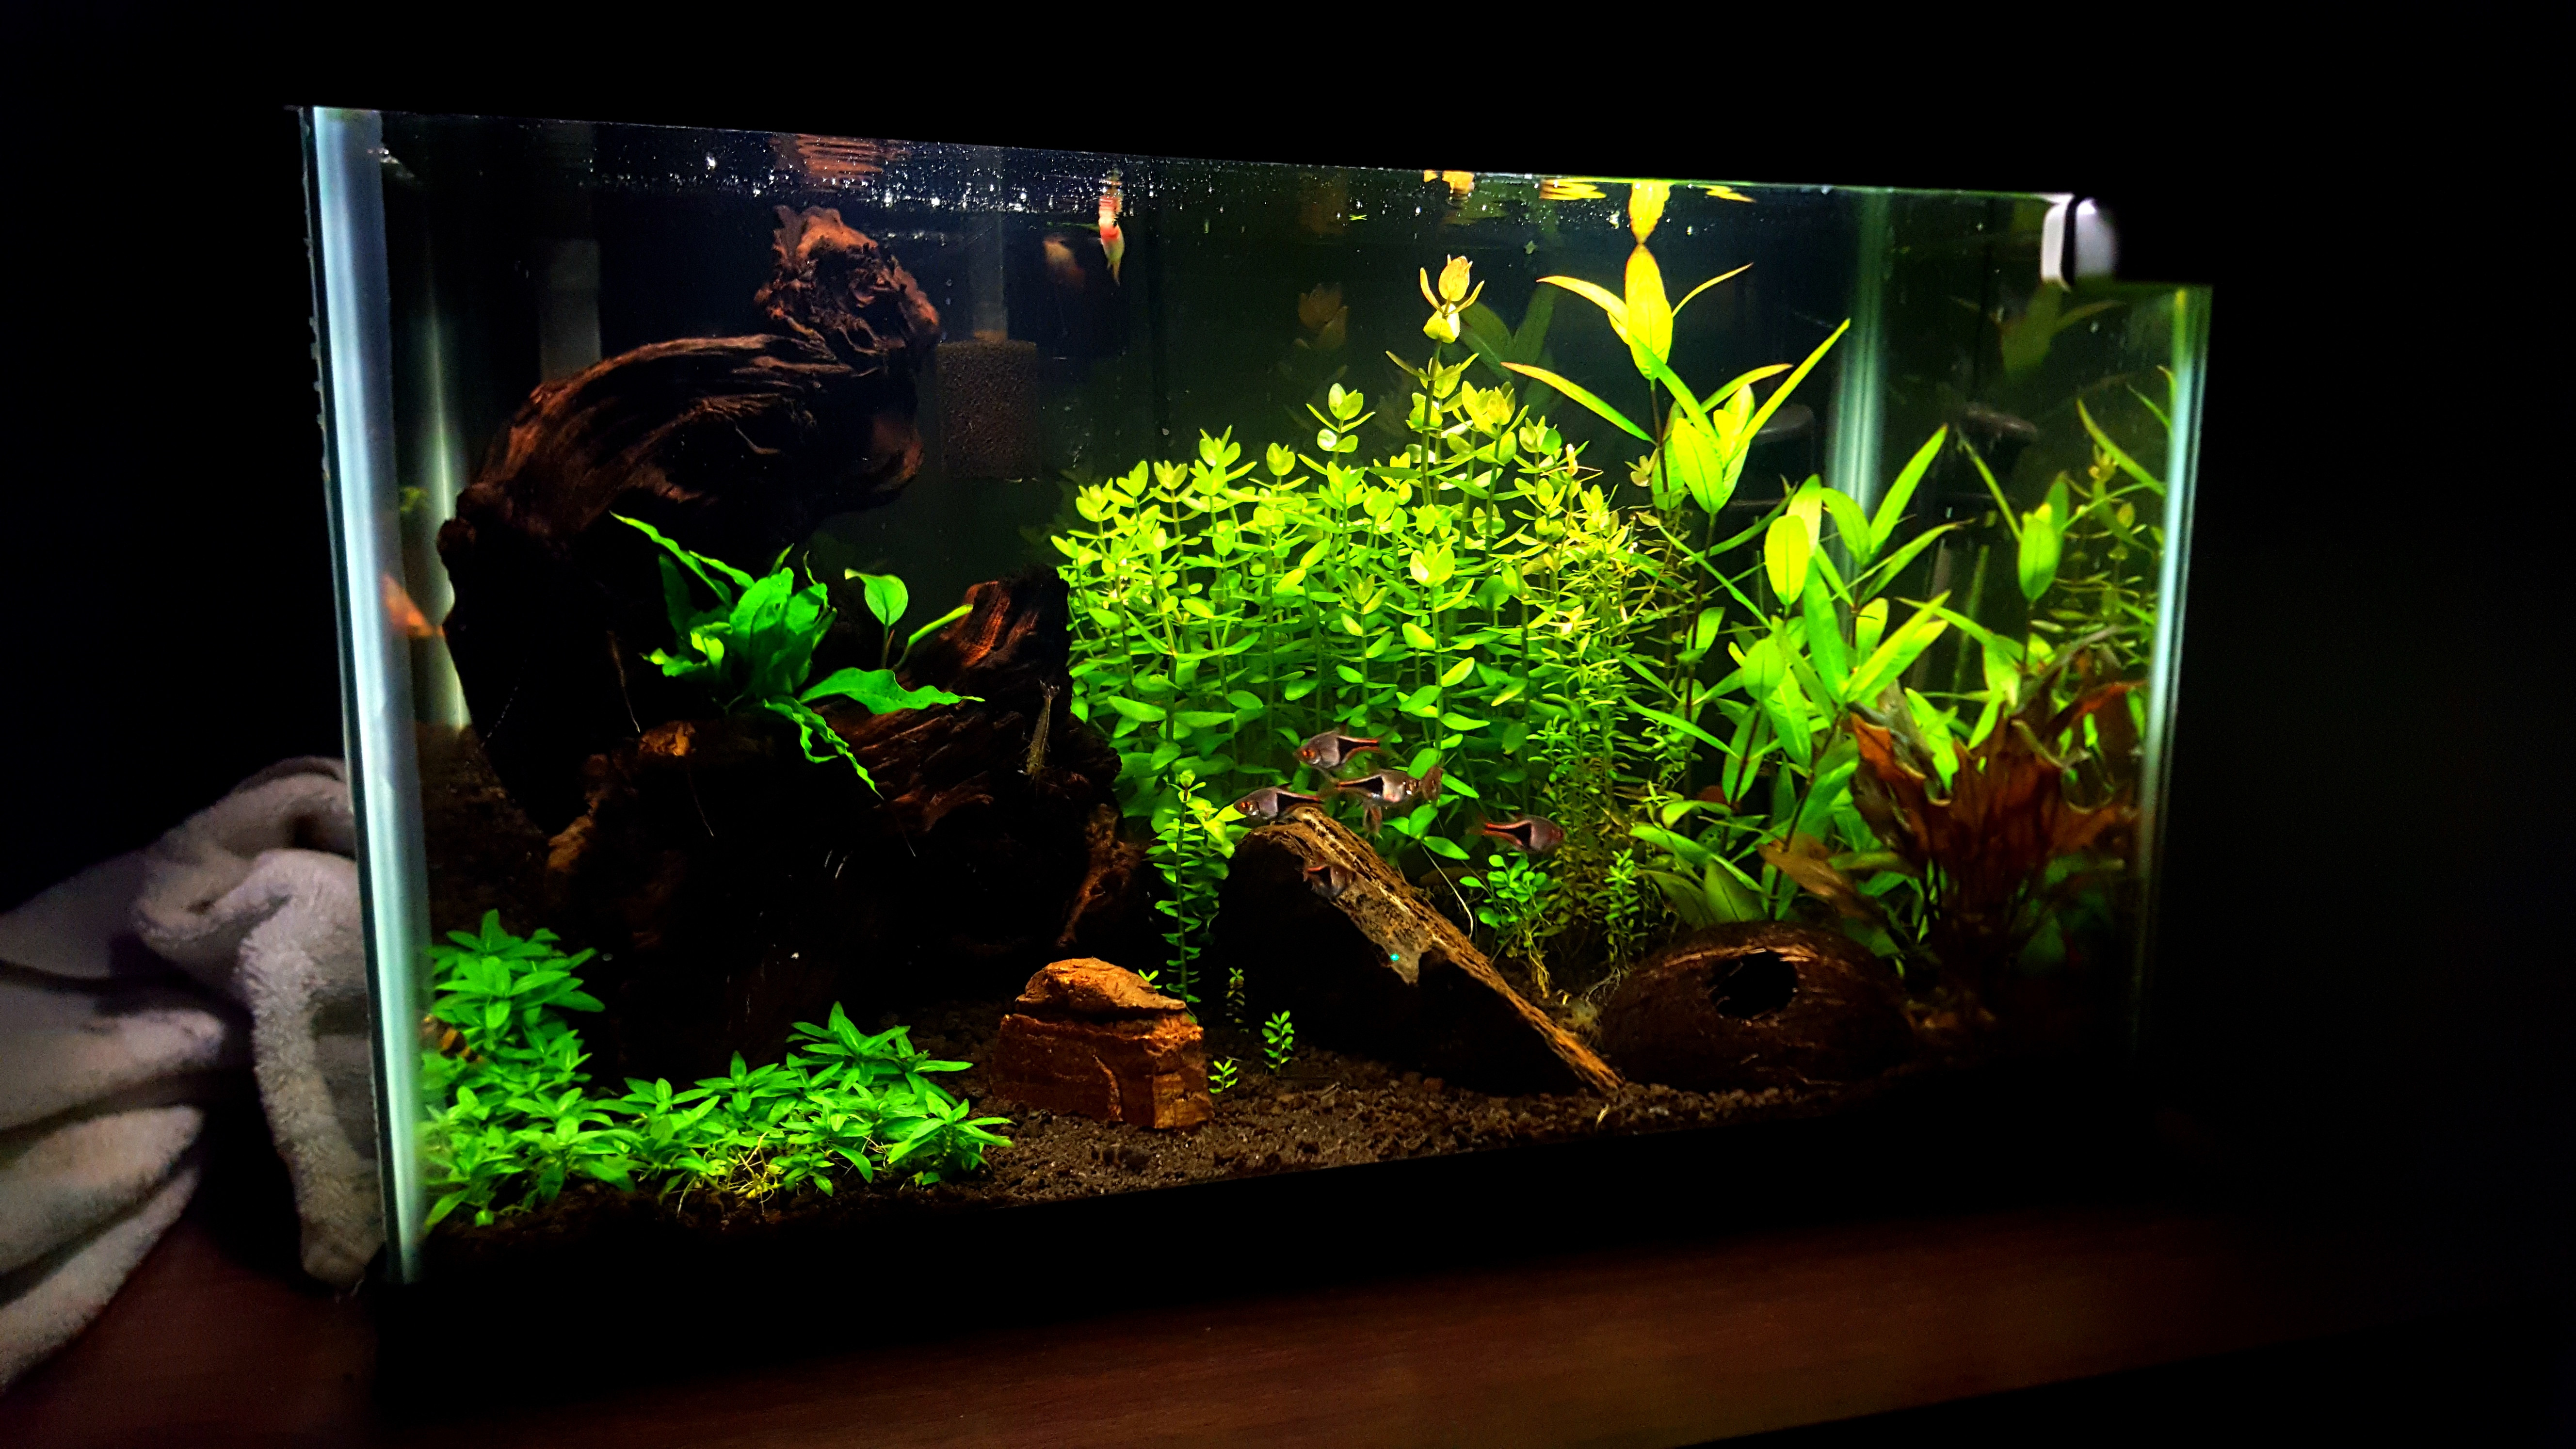 february 2017 totm snailpufferguy aquarium advice